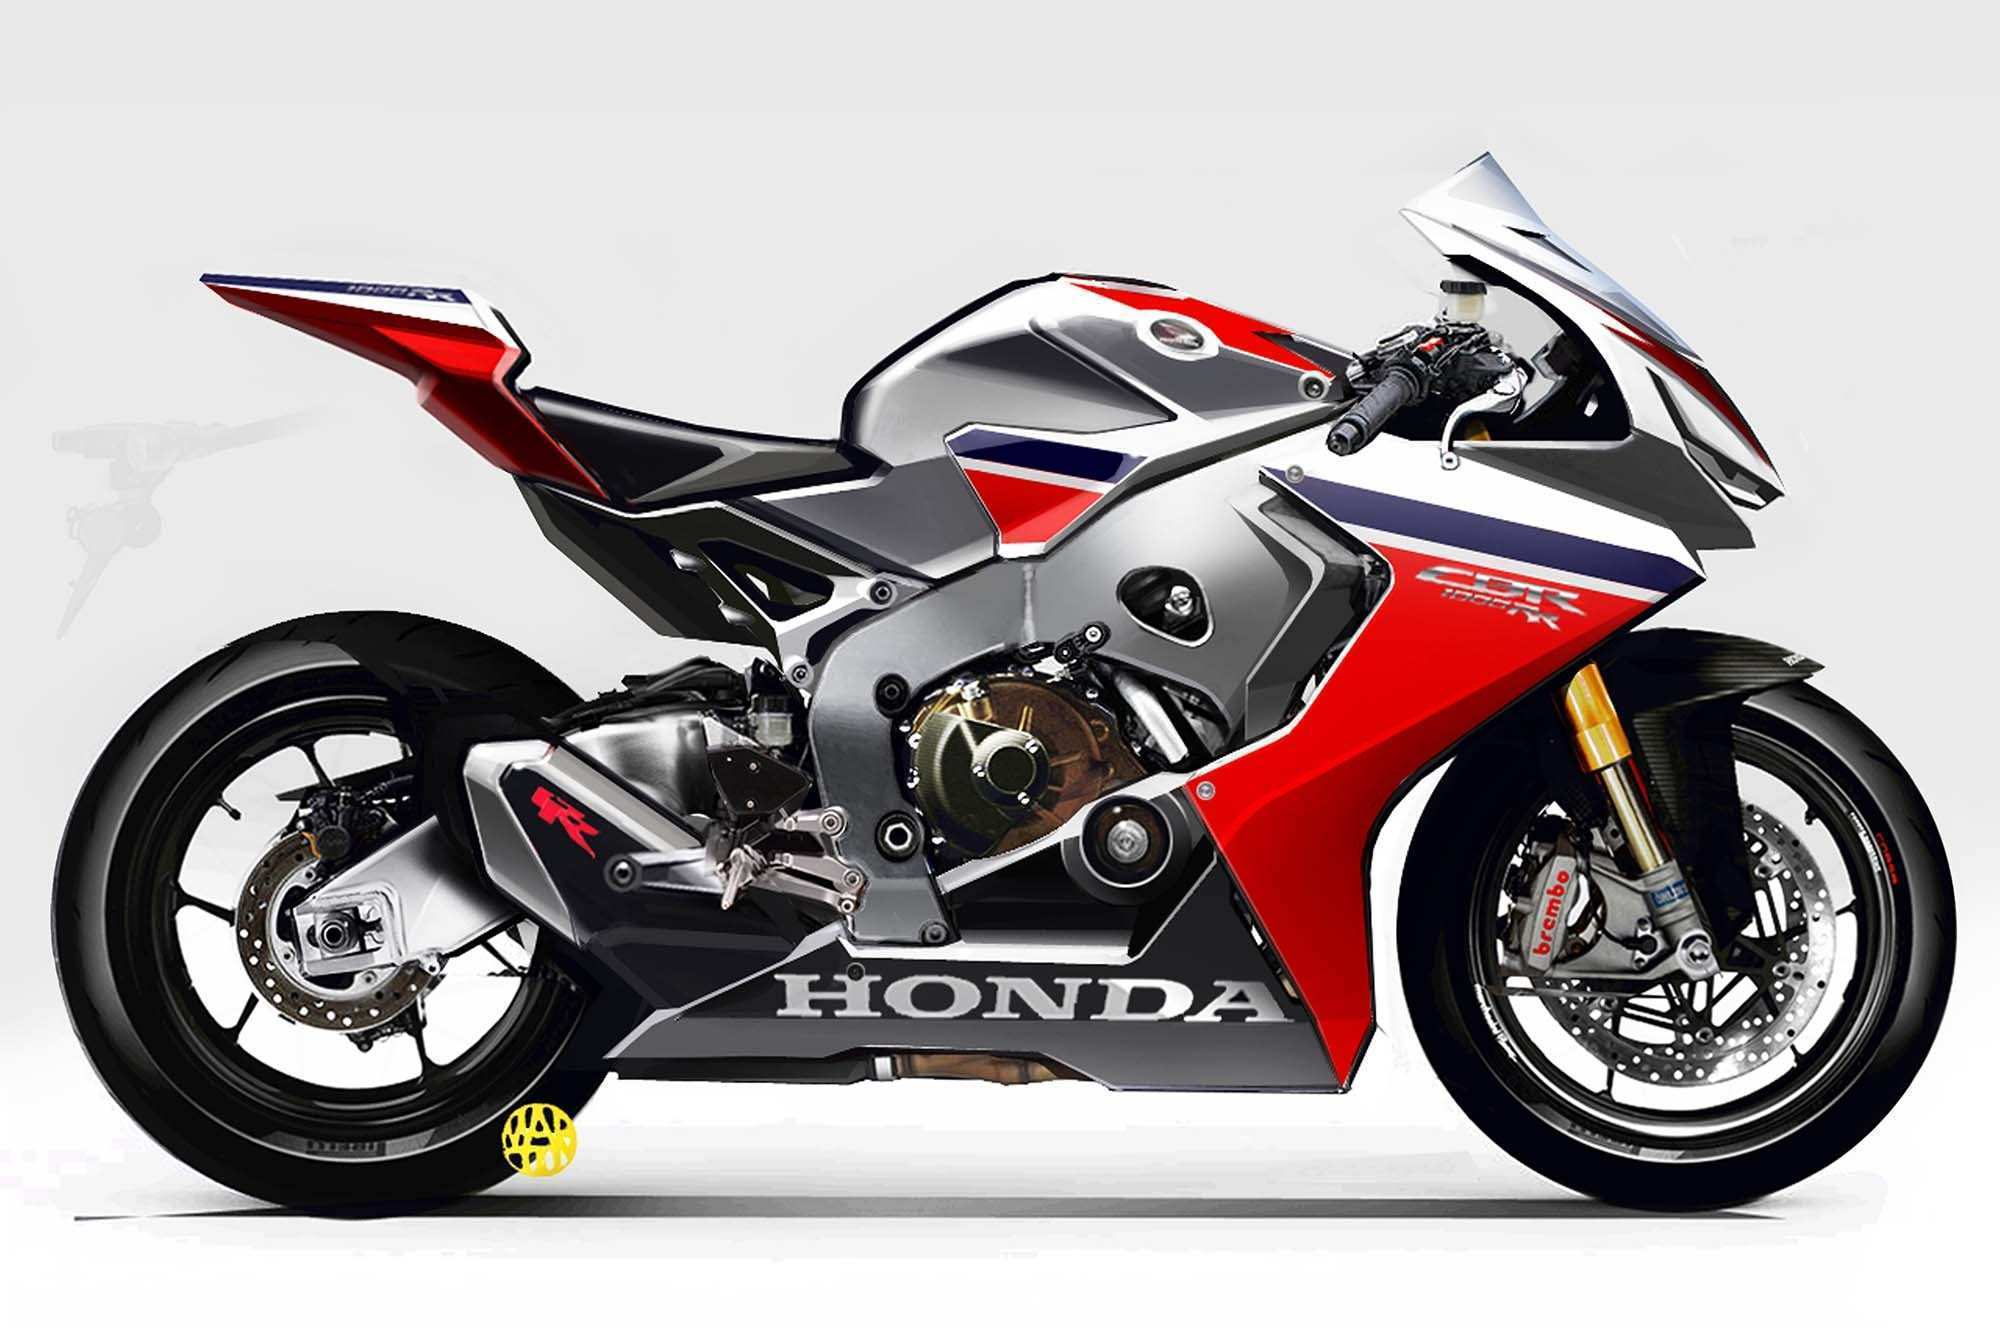 44 All New 2019 Honda Cbr1000Rr Concept by 2019 Honda Cbr1000Rr